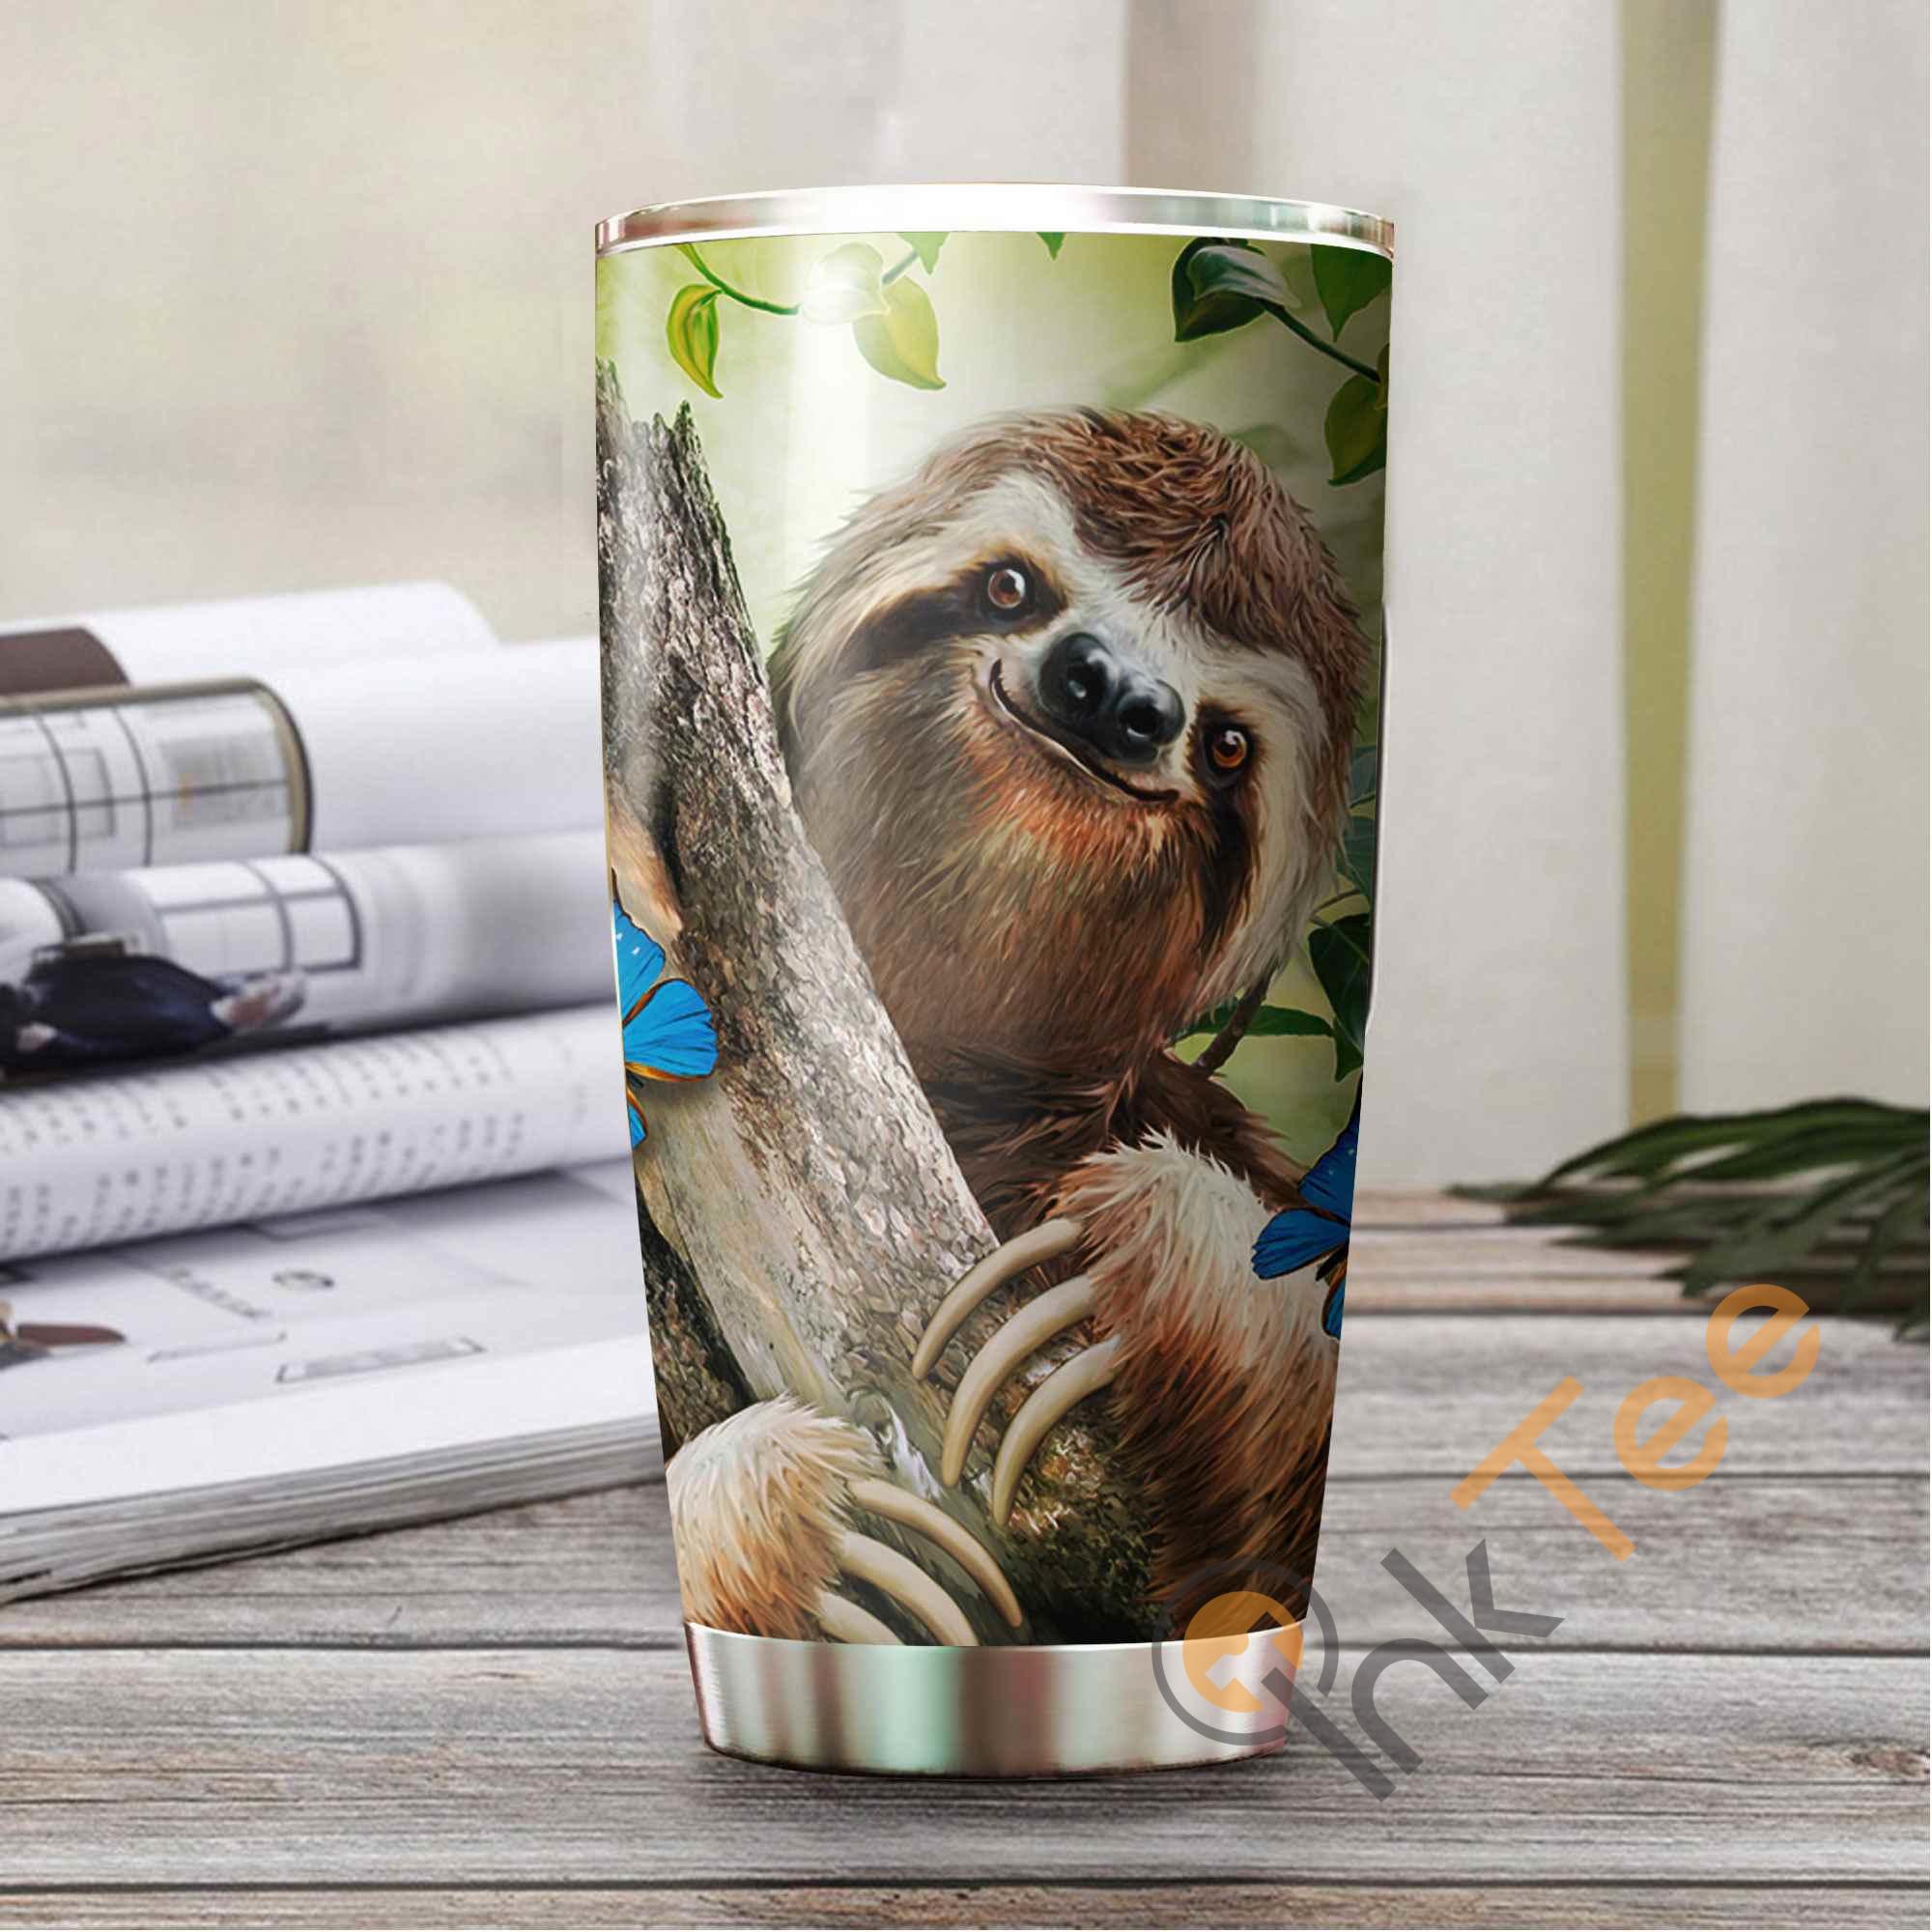 Beautiful Sloth Amazon Best Seller Sku 3251 Stainless Steel Tumbler